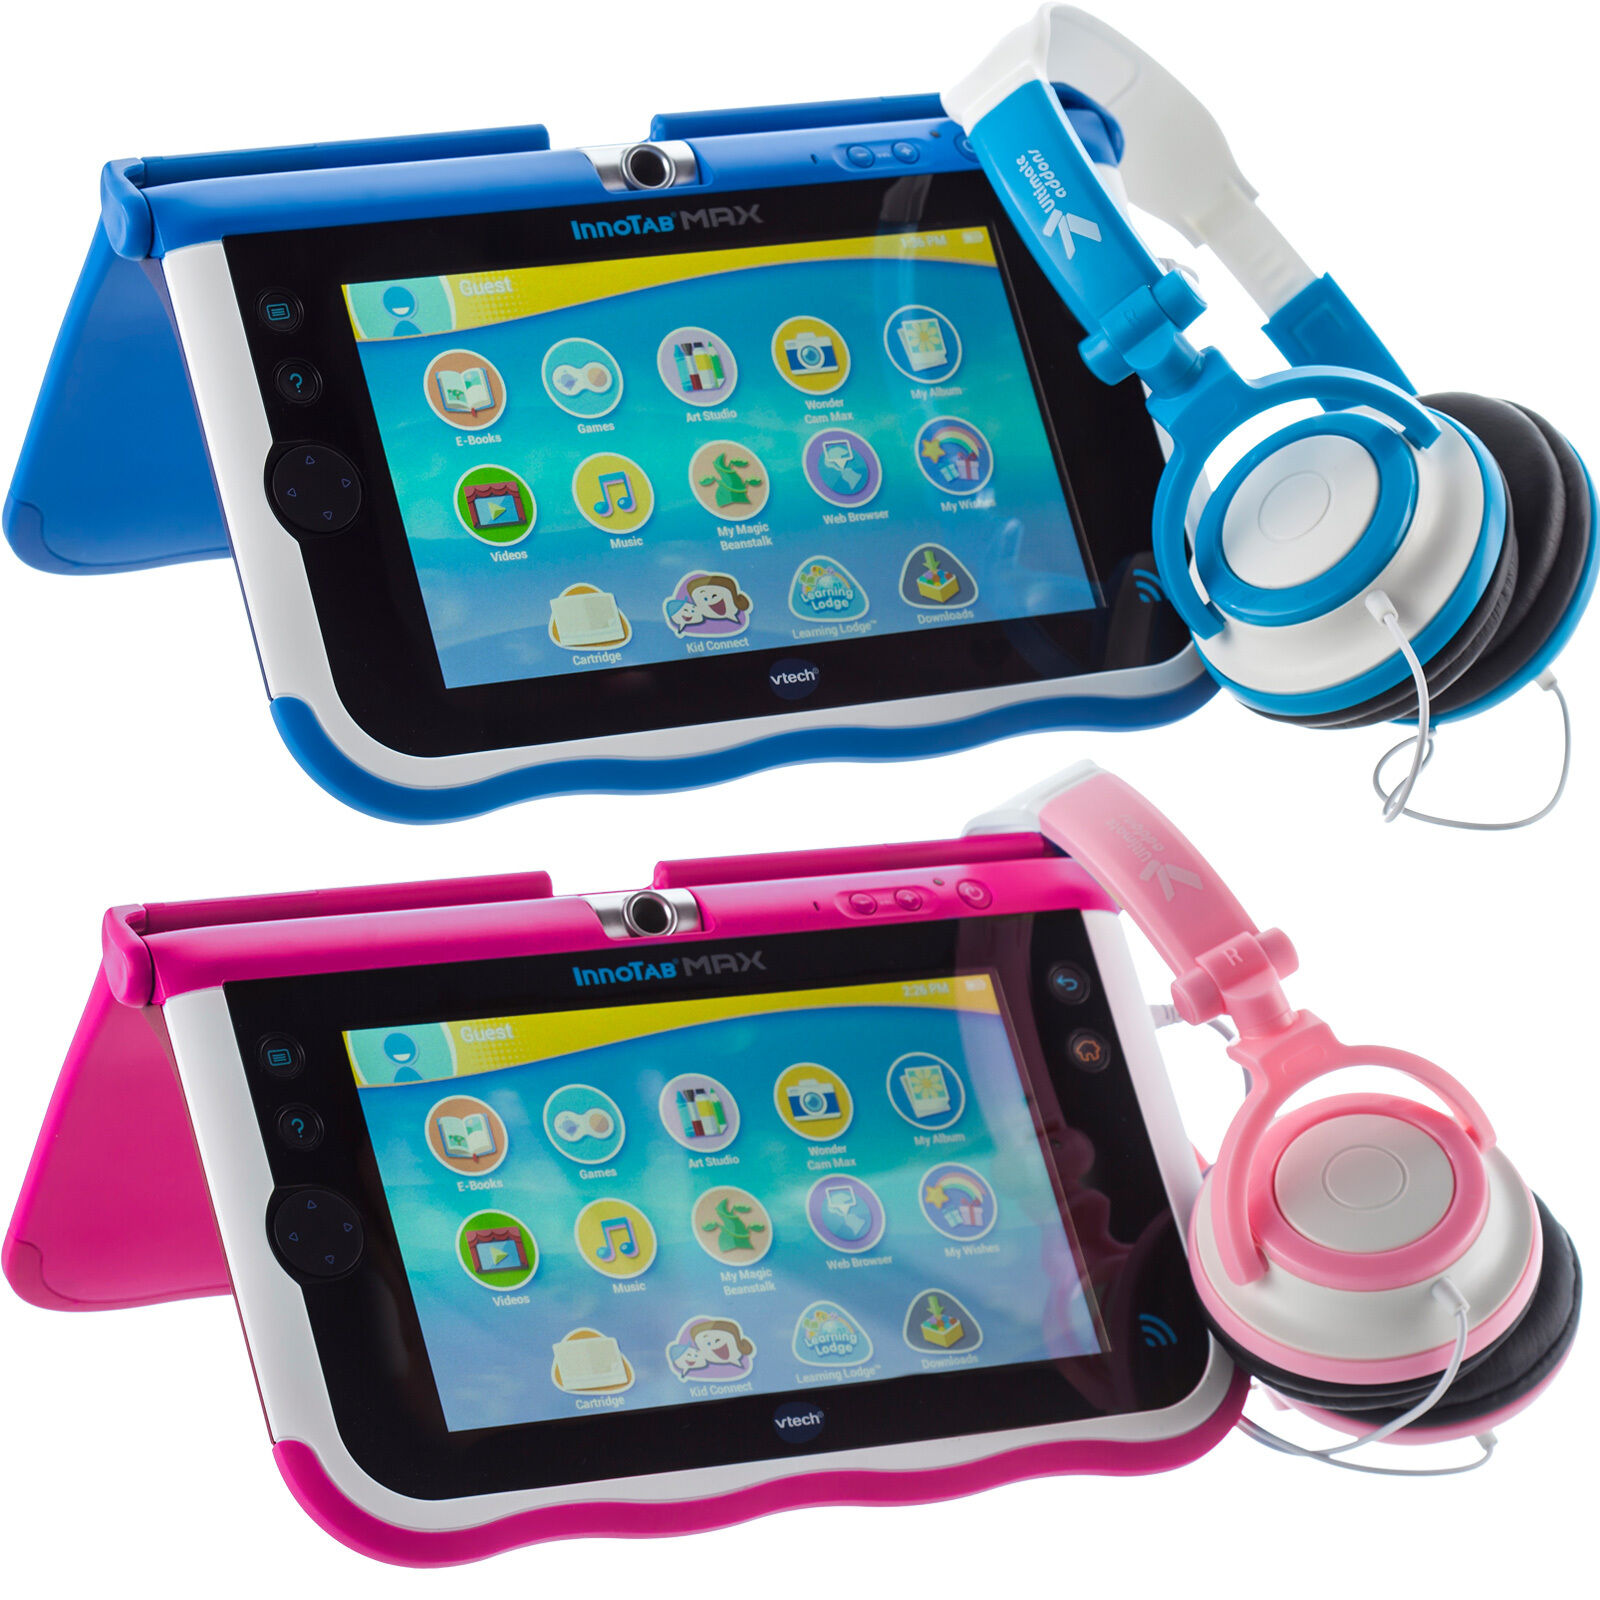 small childrens blue pink dj style kids folding headphones for vtech innotab max